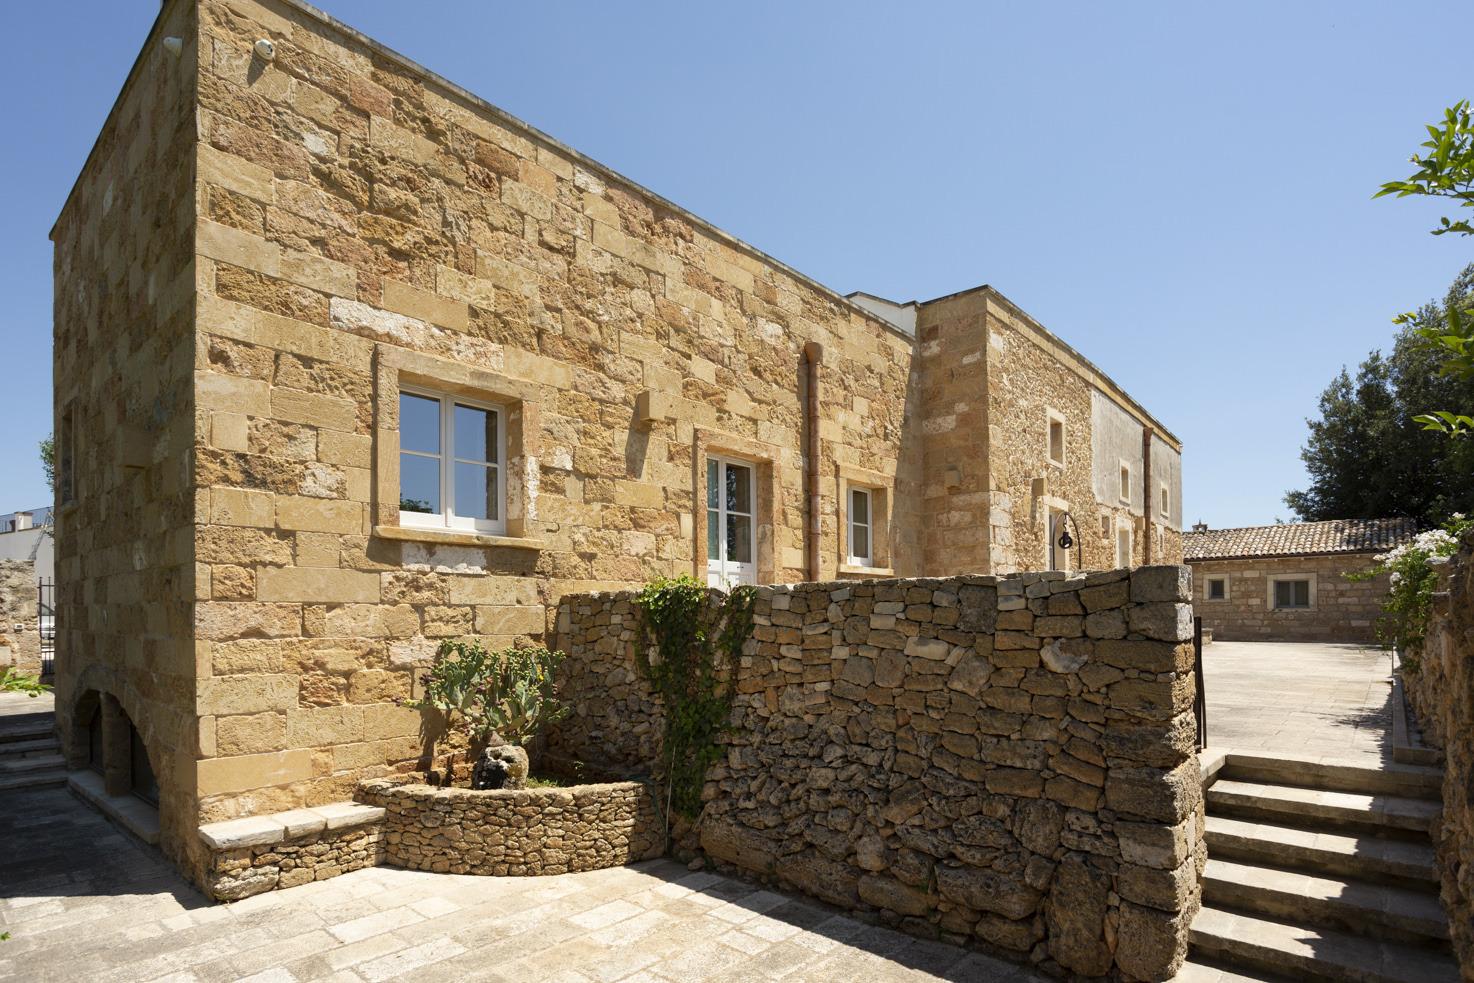 Façade of Masseria Borgo Mortella